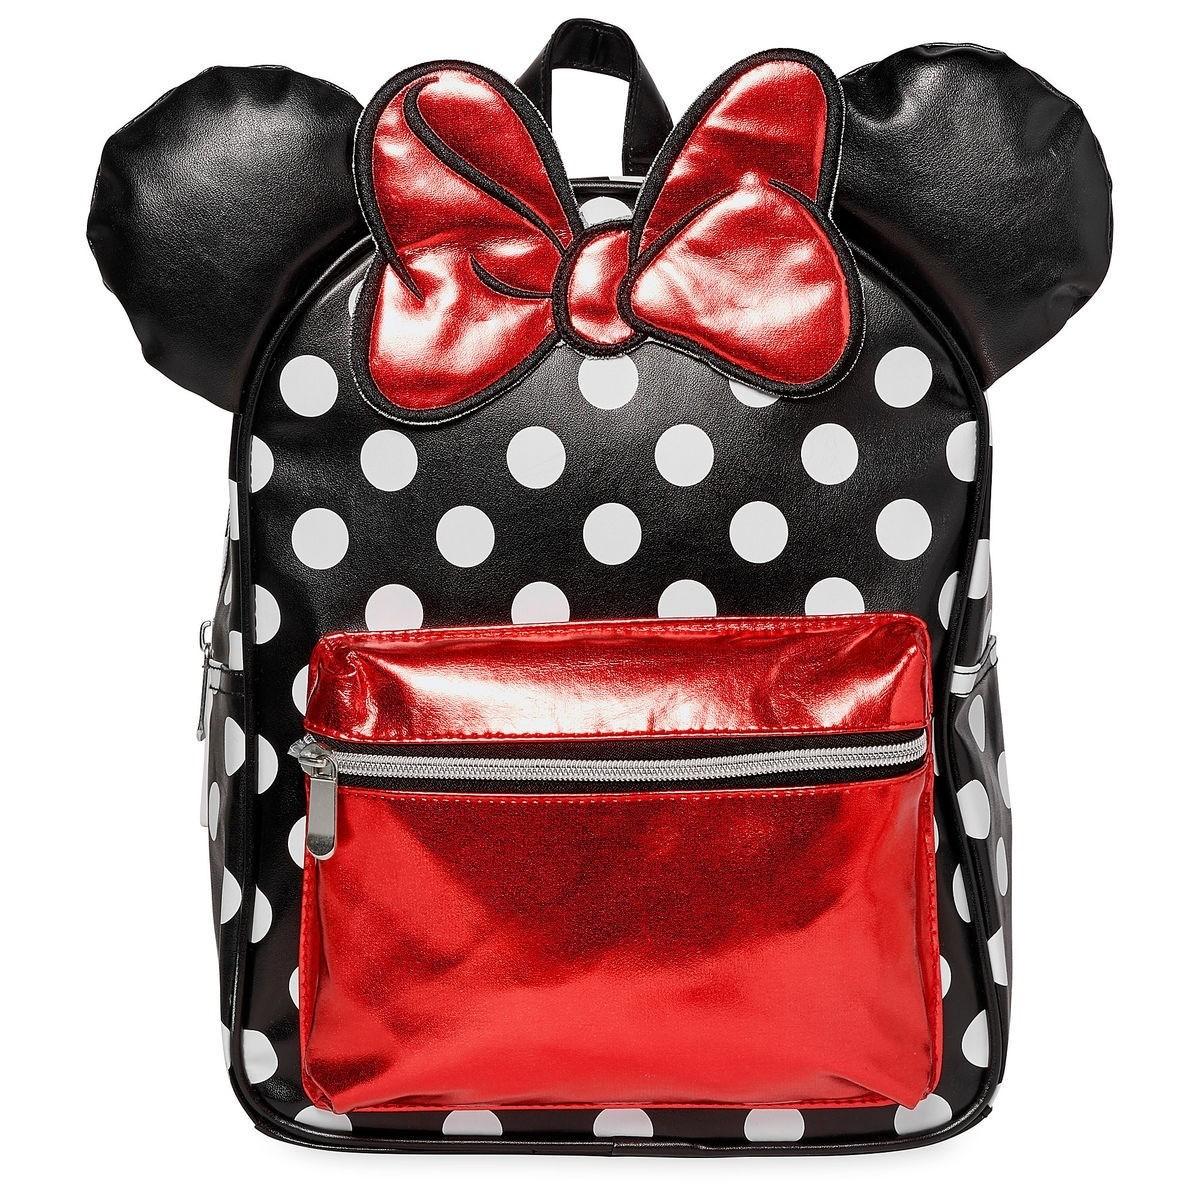 Mochila Minnie Mouse R55